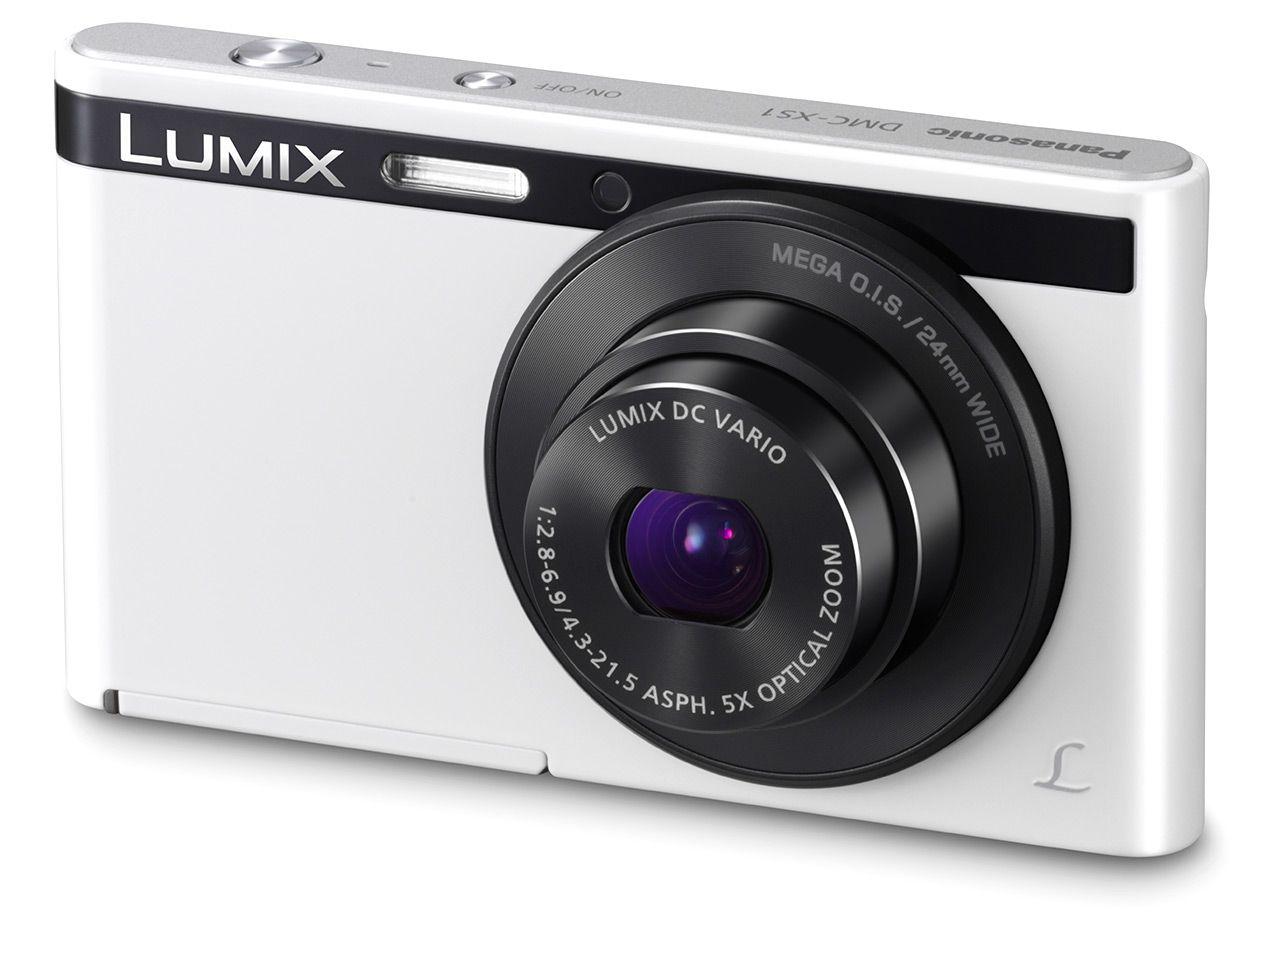 Panasonic Lumix DMC-XS1.Foto: Panasonic